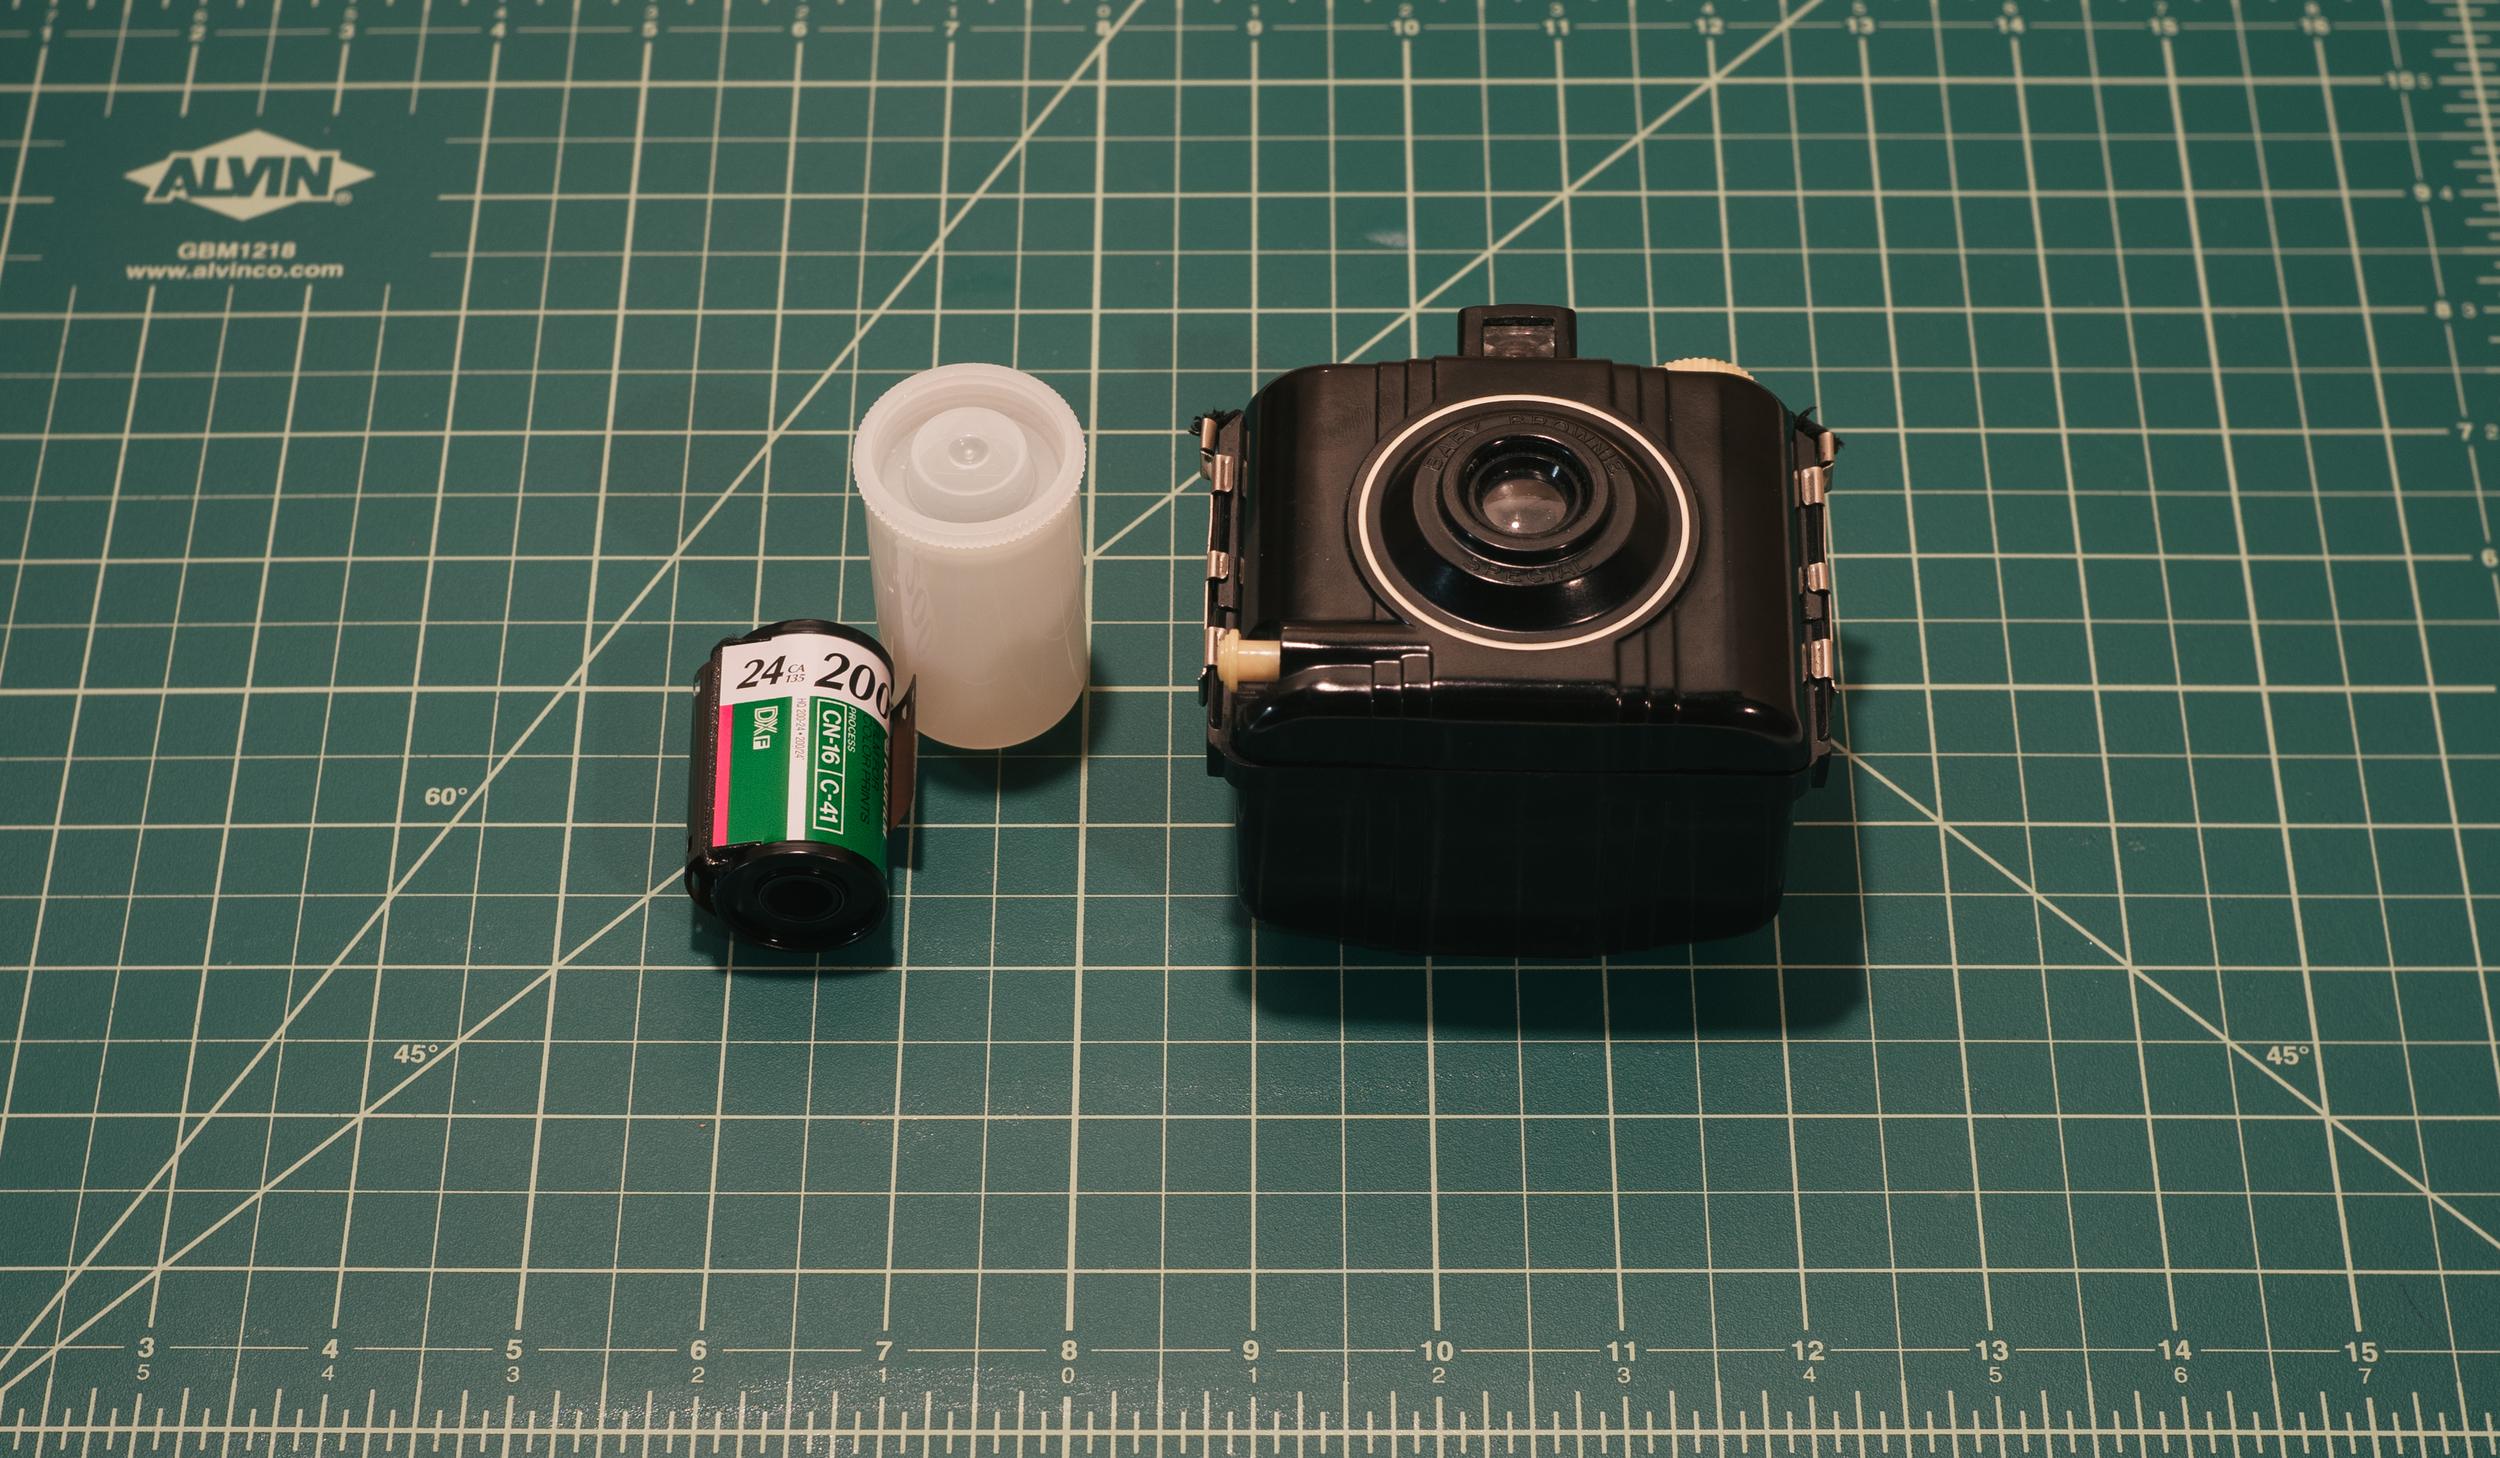 Expired FujiColor SuperHQ / Kodak Baby Brownie Super